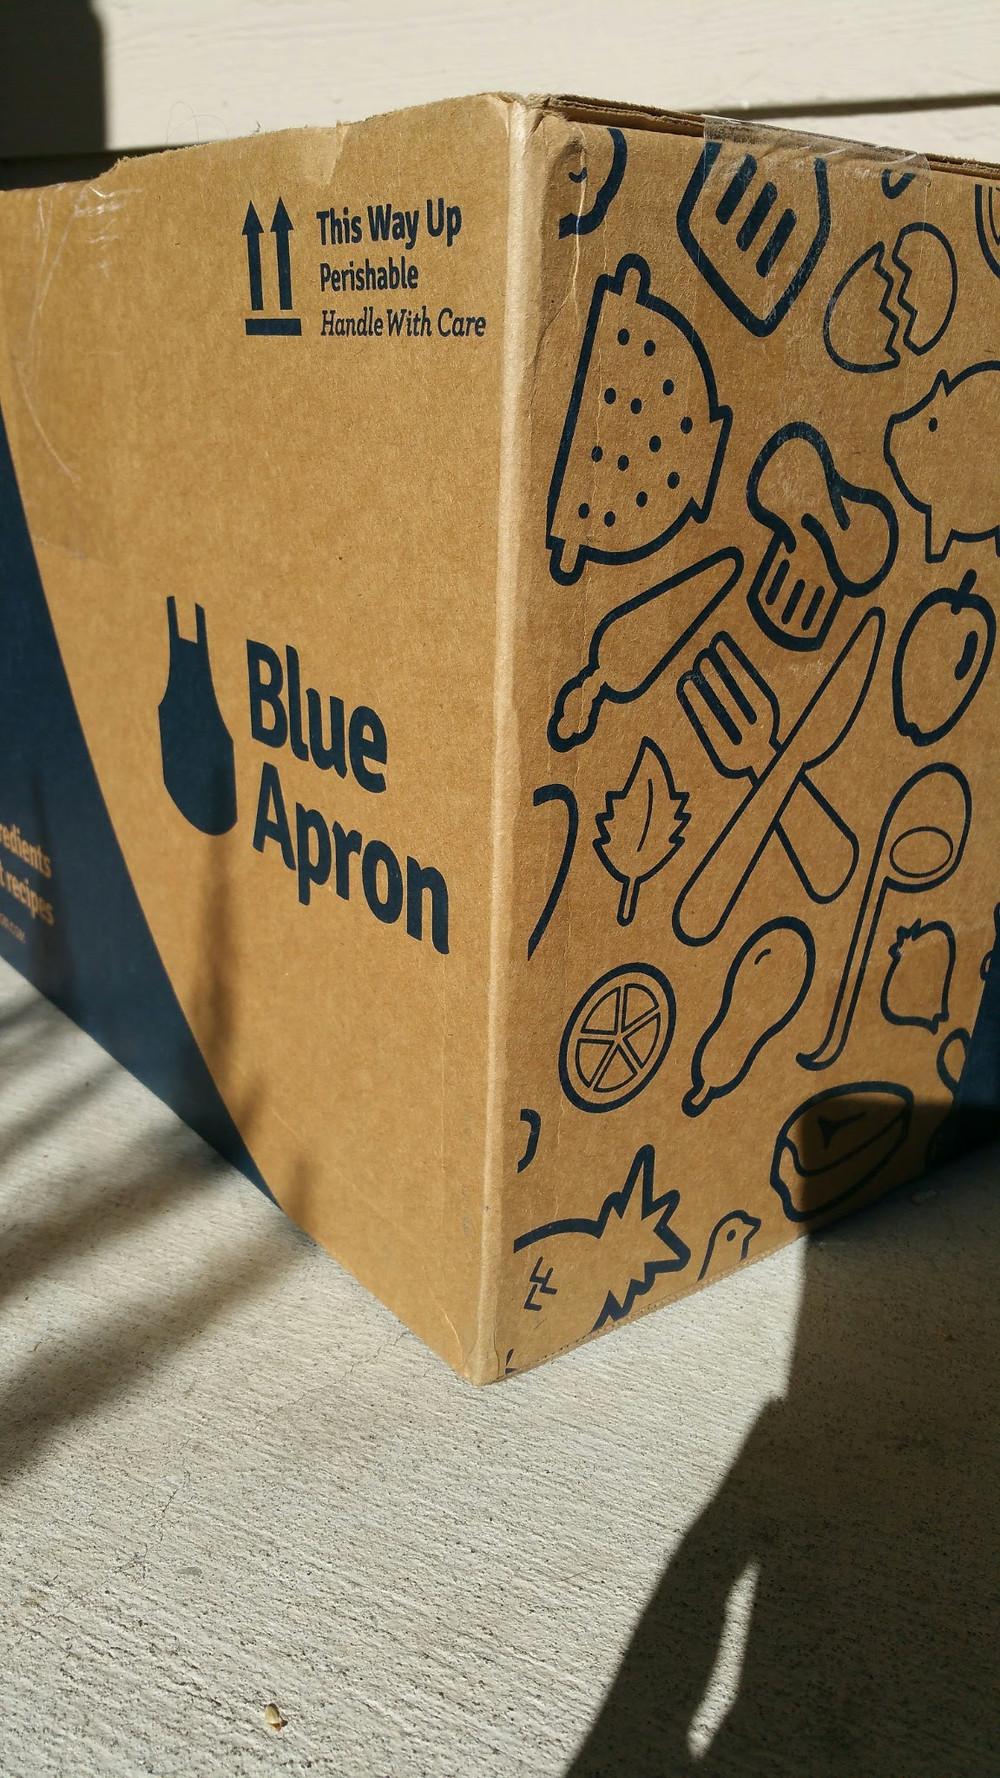 Blue Apron box at the door